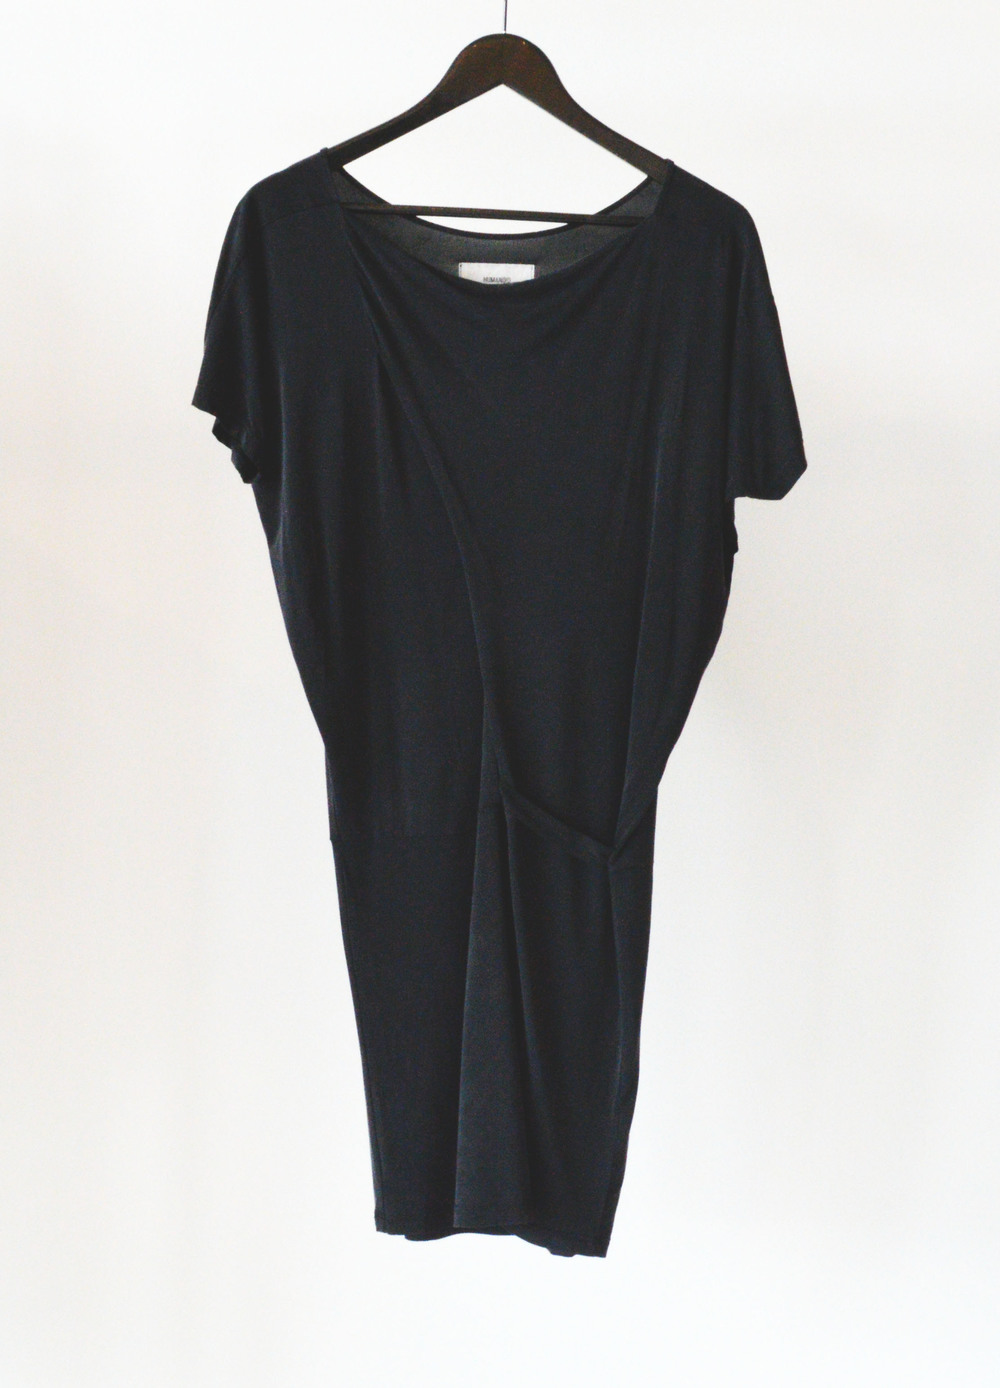 black dress - $309